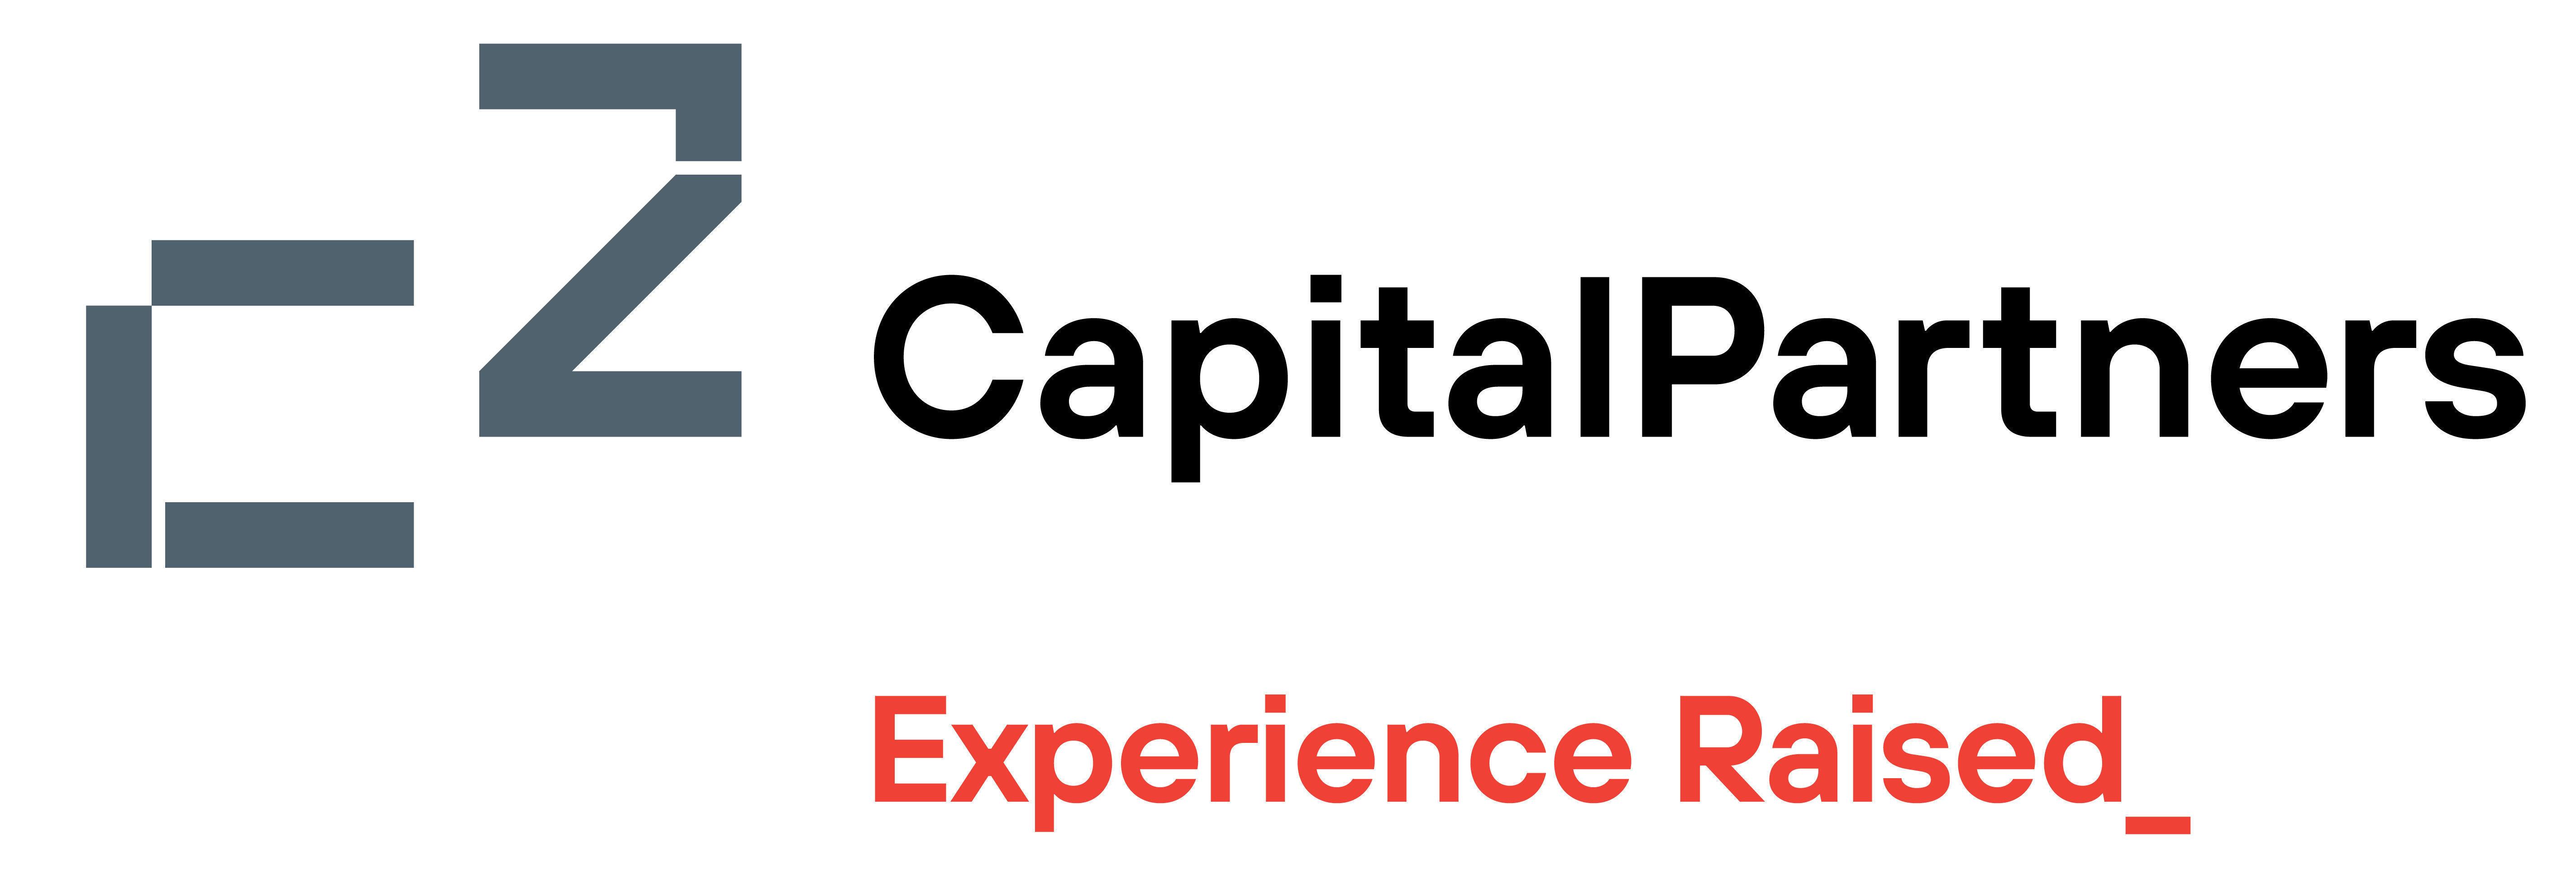 C2 Capital Partners logo